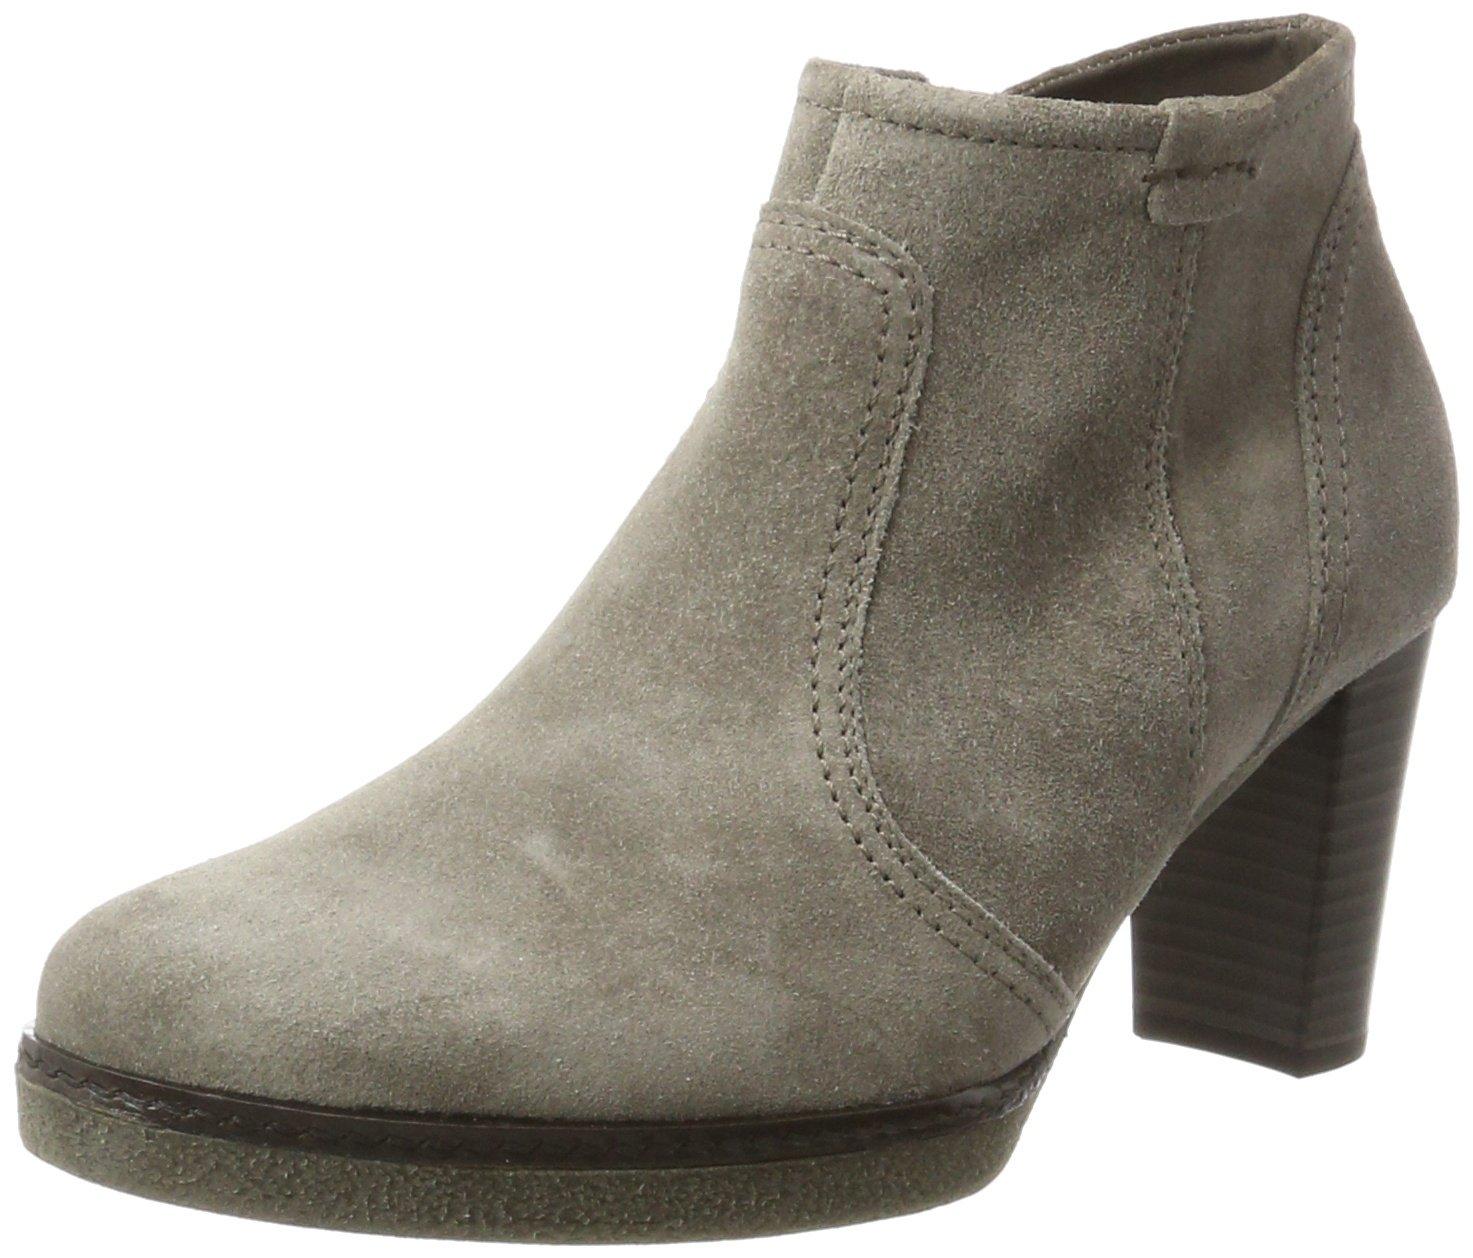 BasicBottes Gabor Wallaby38 Eu Shoes FemmeMarron13 5 8wO0Nvmn